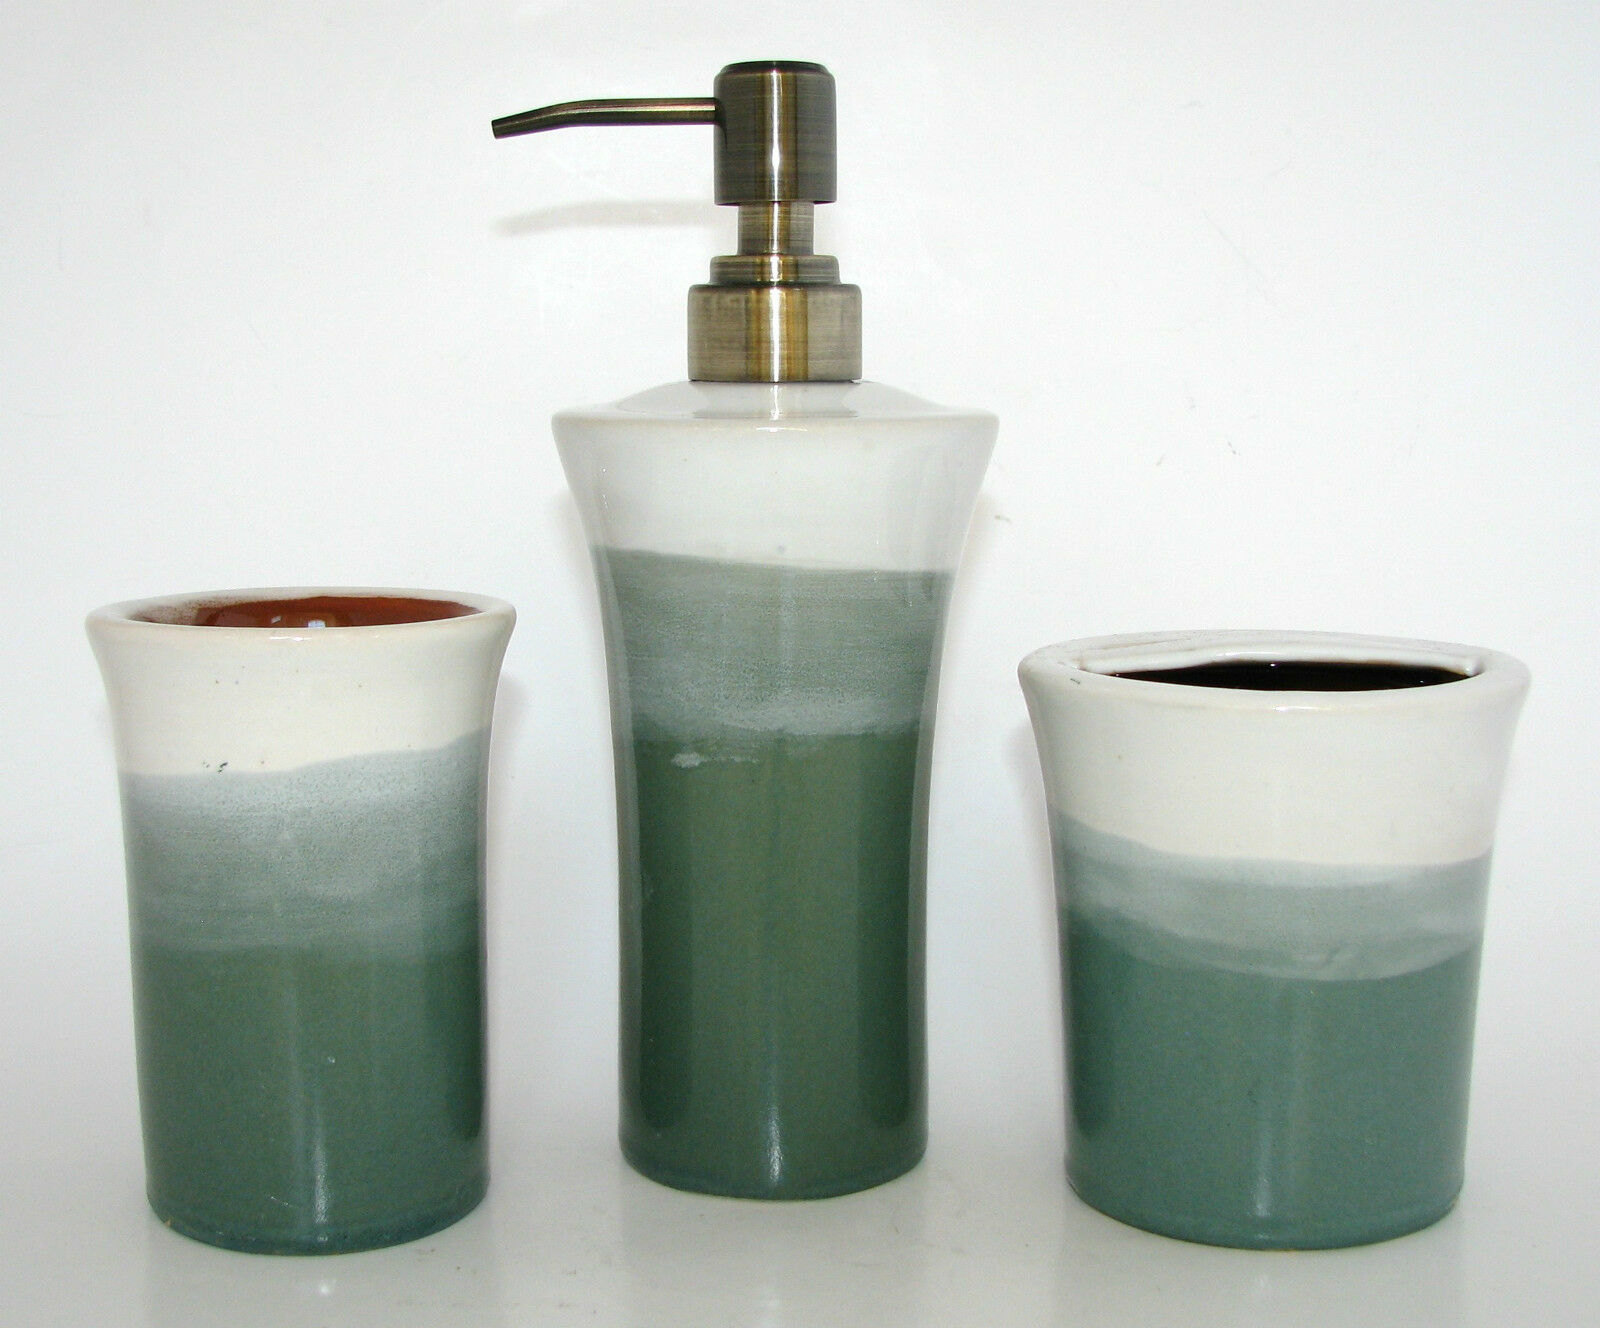 3PC SET TEAL Weiß CERAMIC BATHROOM SOAP DISPENSER+TOOTHBRUSH HOLDER+TUMBLER-NEW